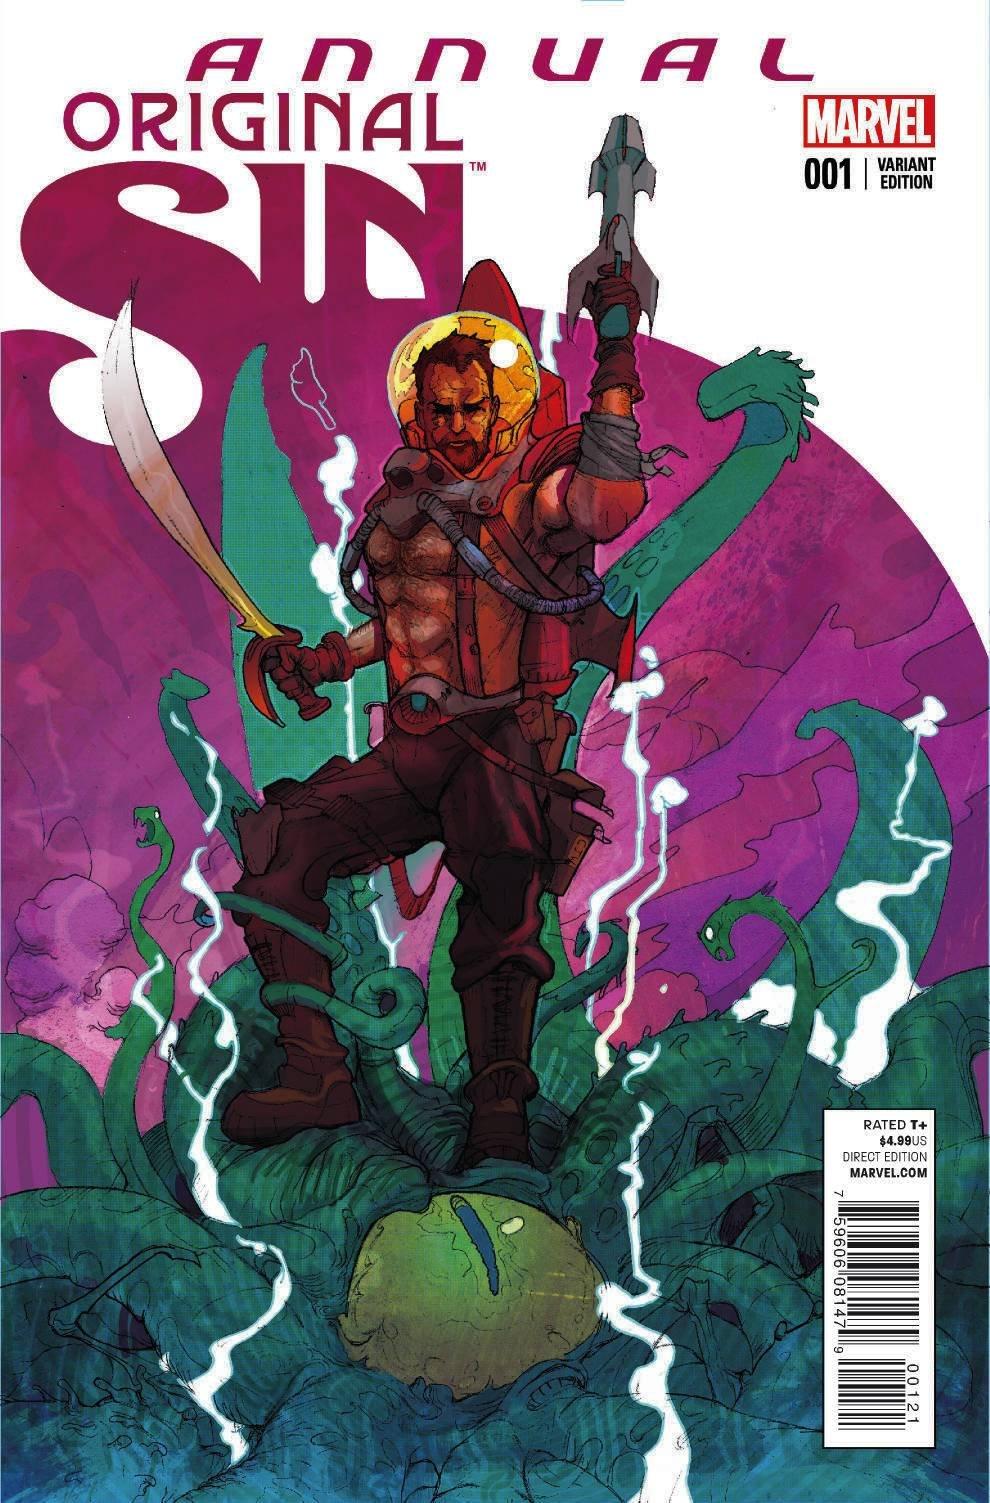 2014 Jason Latour Original Sin Annual No.1